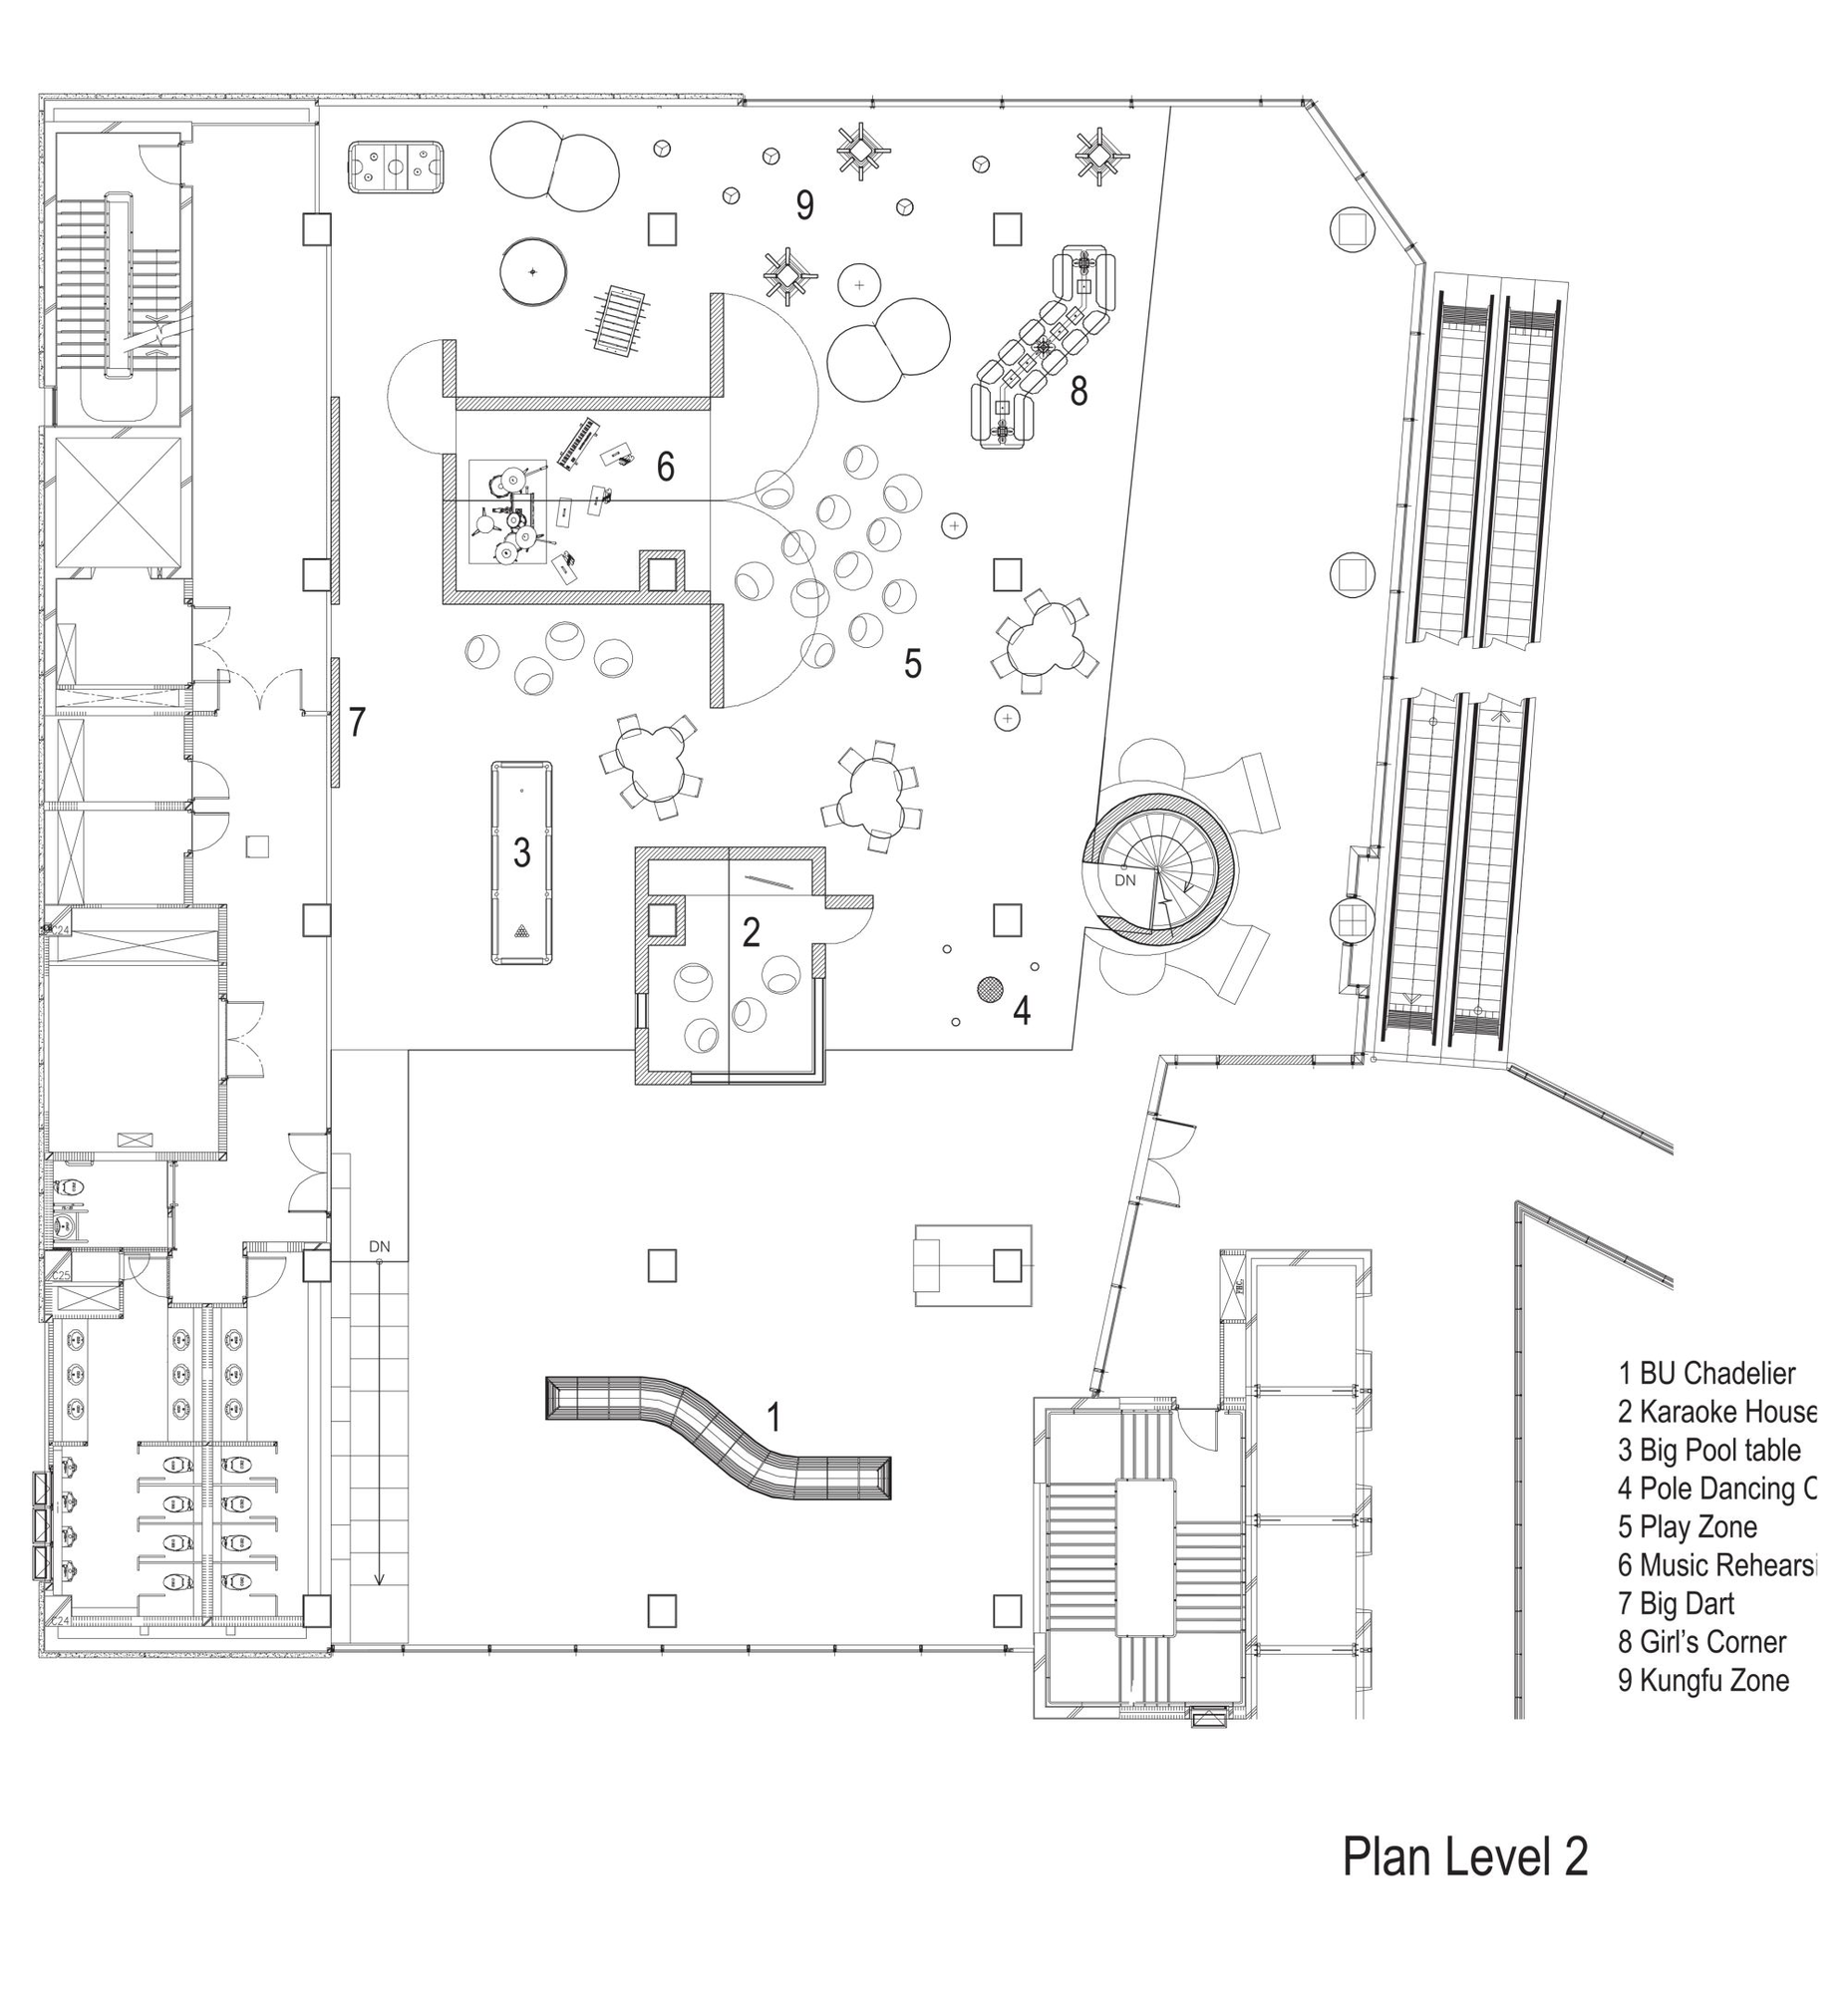 hotel lounge floor plan -   Google